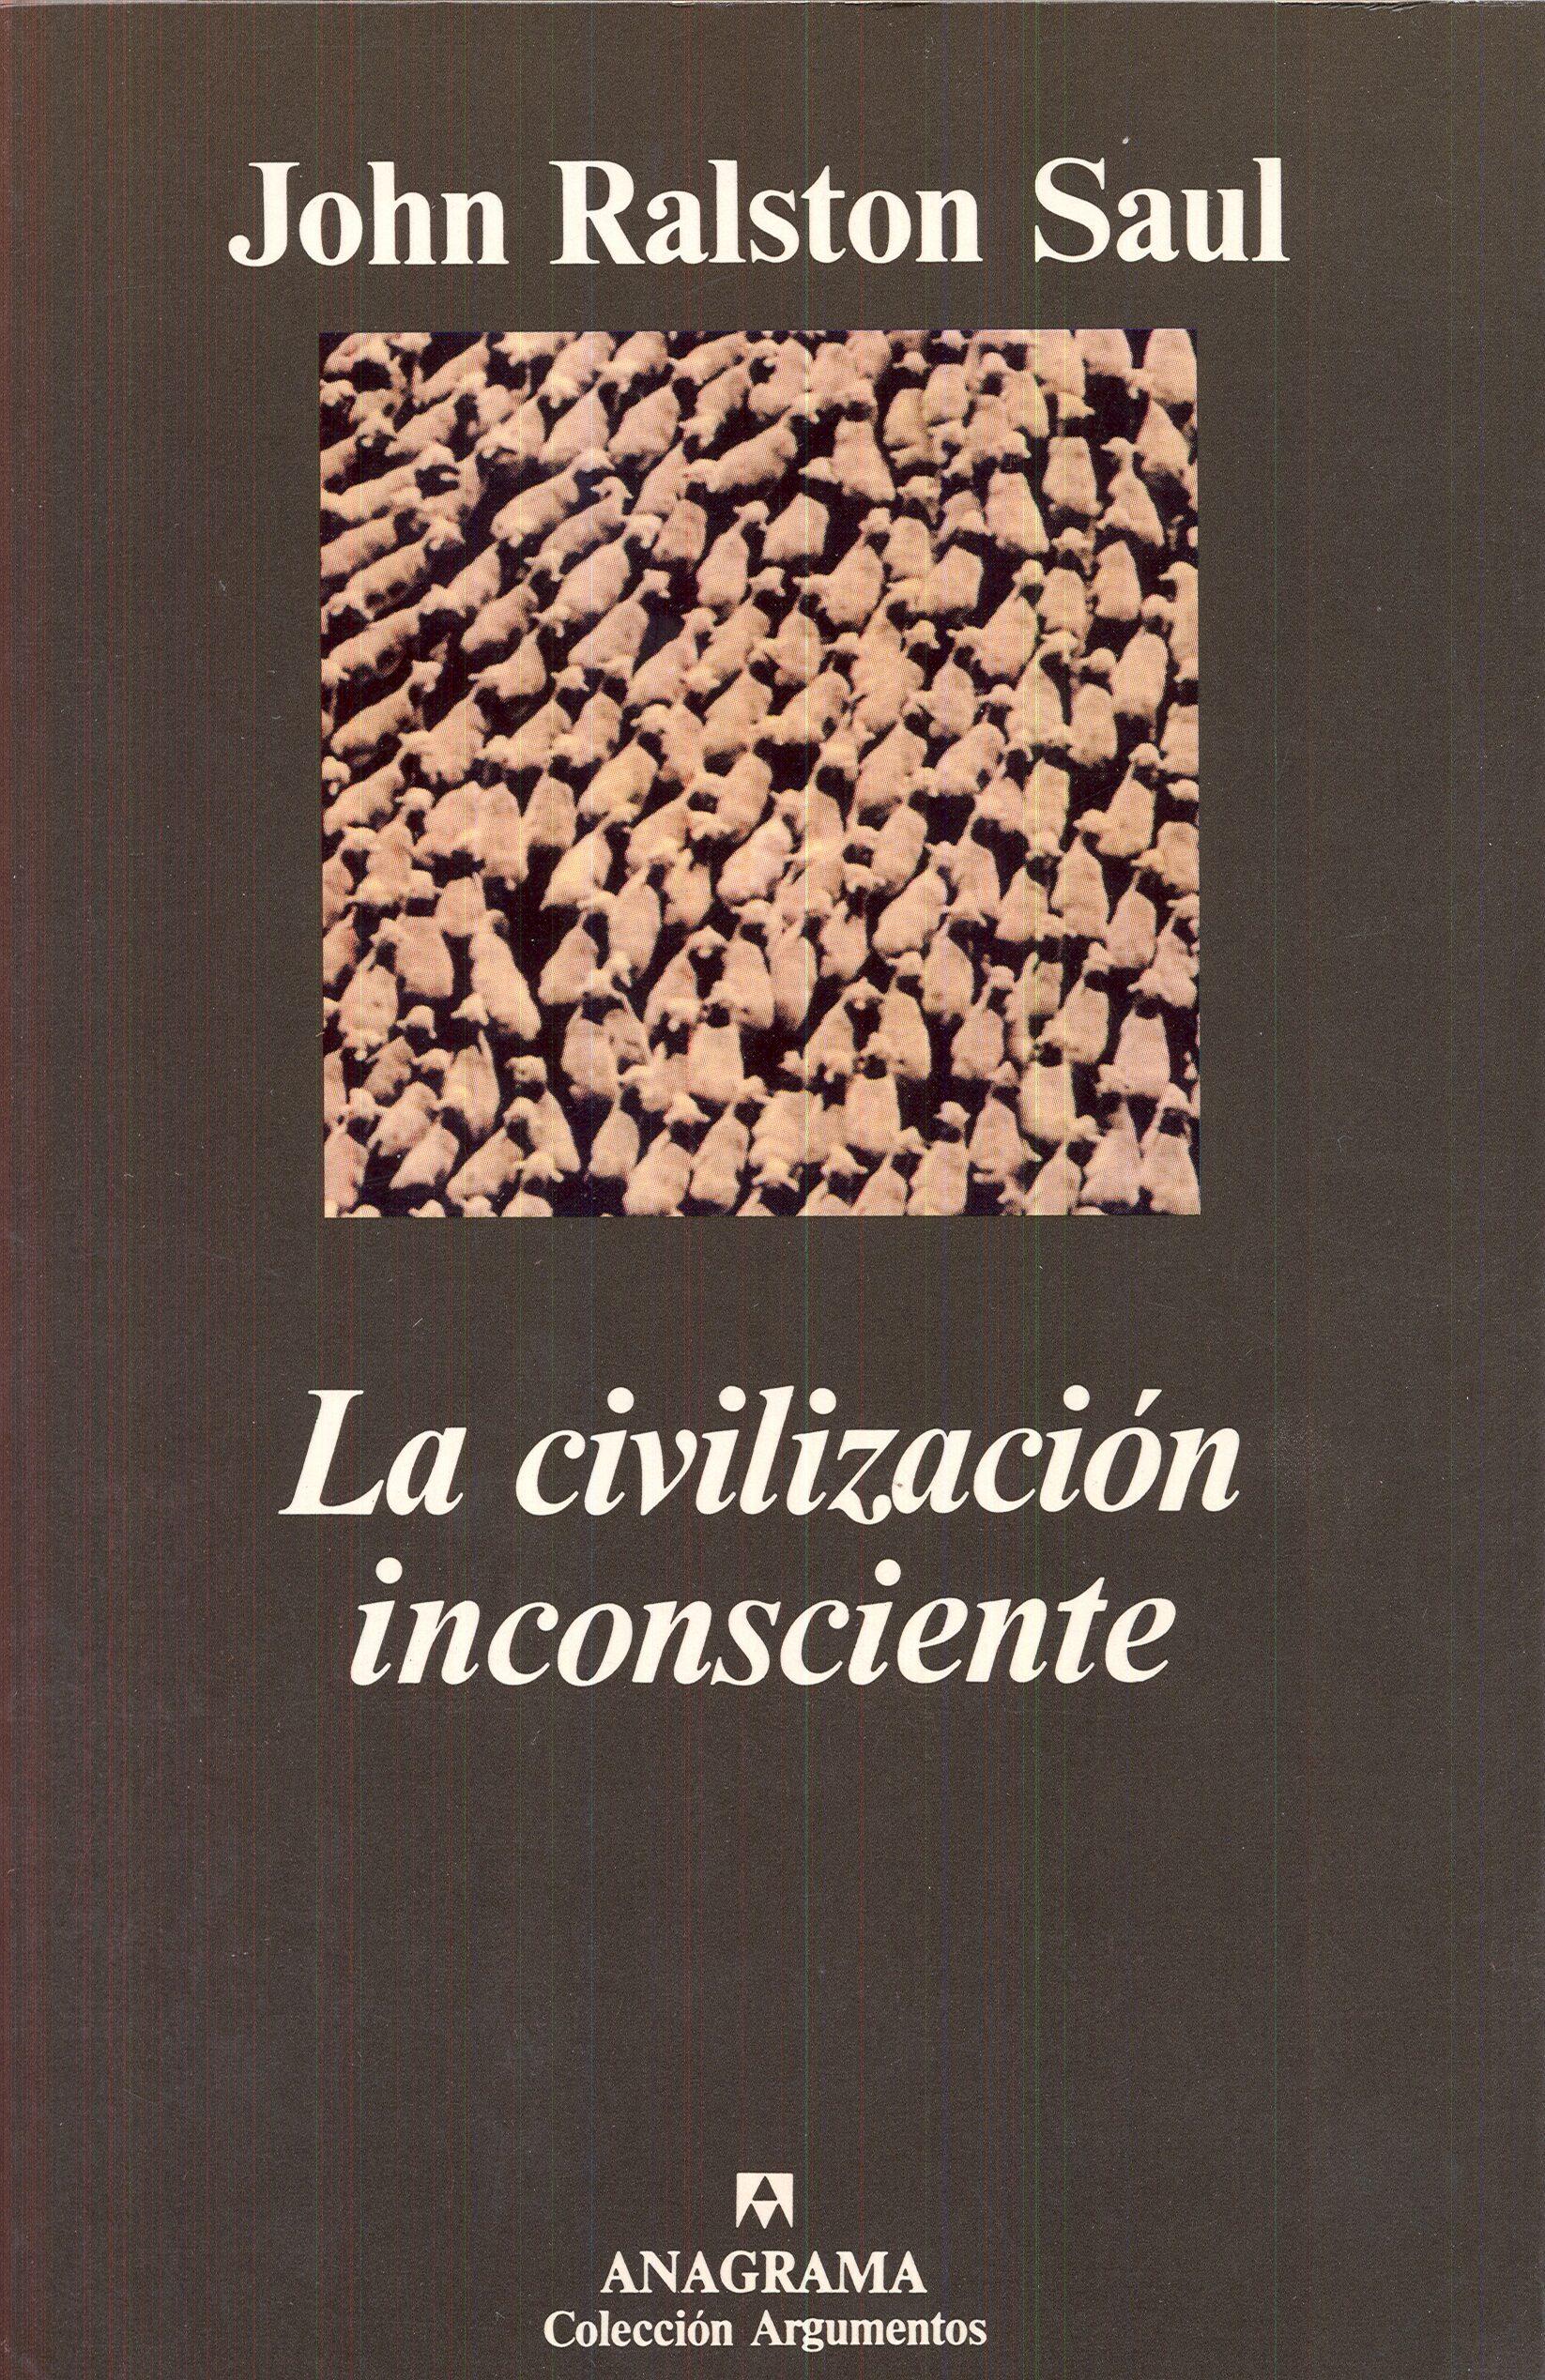 la civilizacion inconsciente-john ralston saul-9788433905451